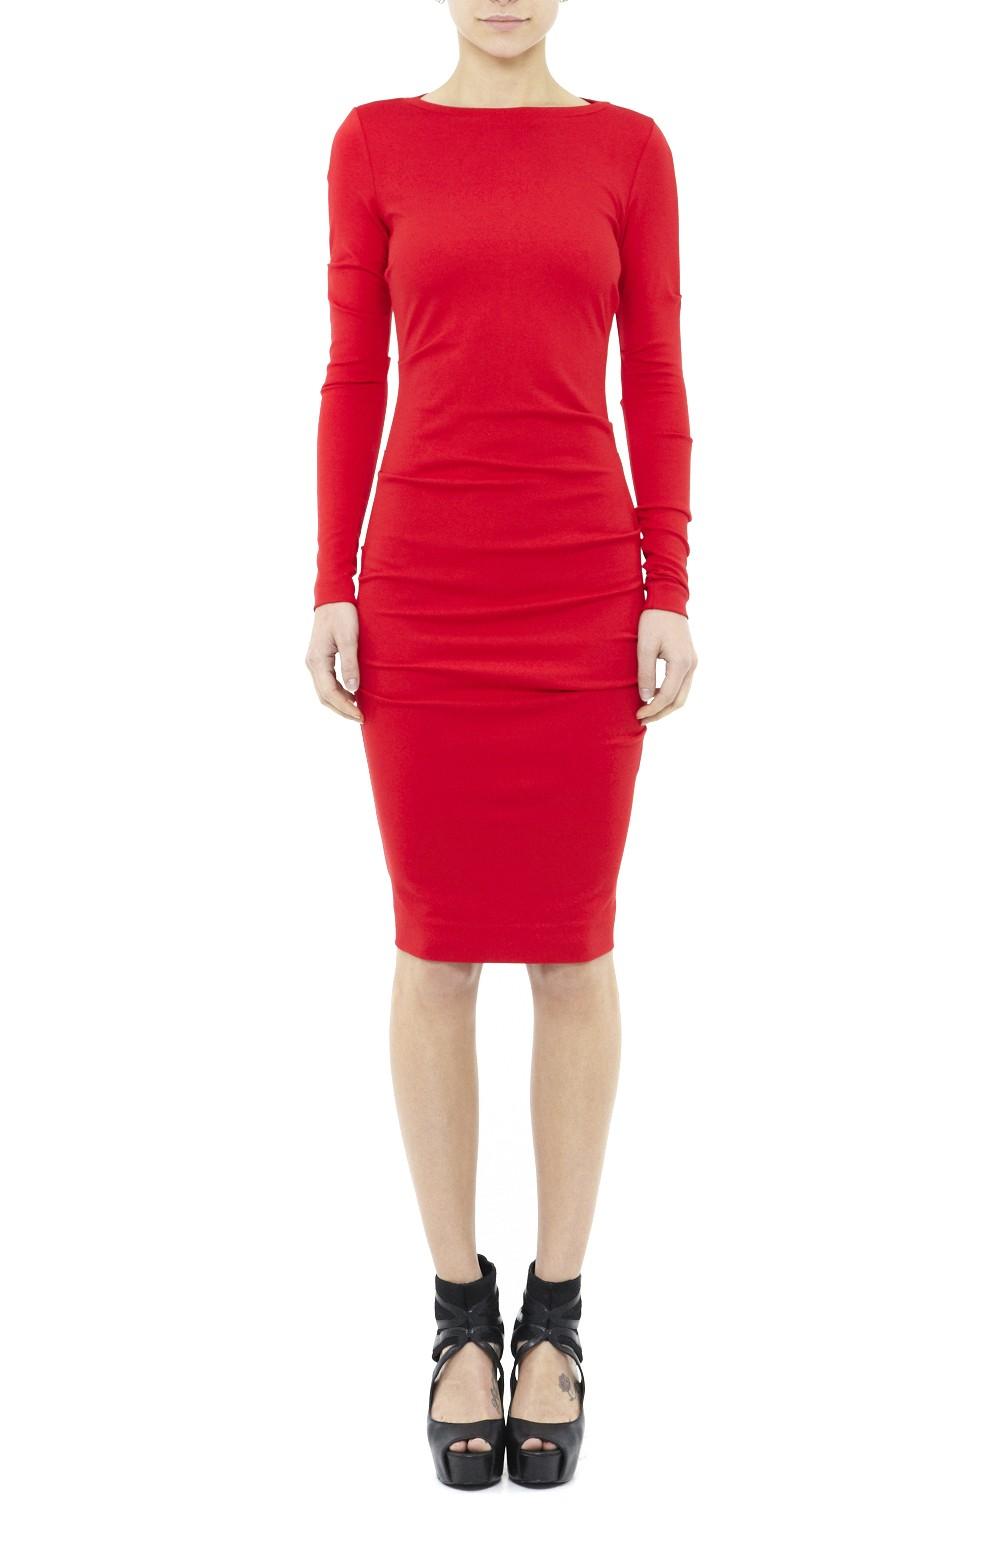 Christina Long Sleeve Ponte Dress